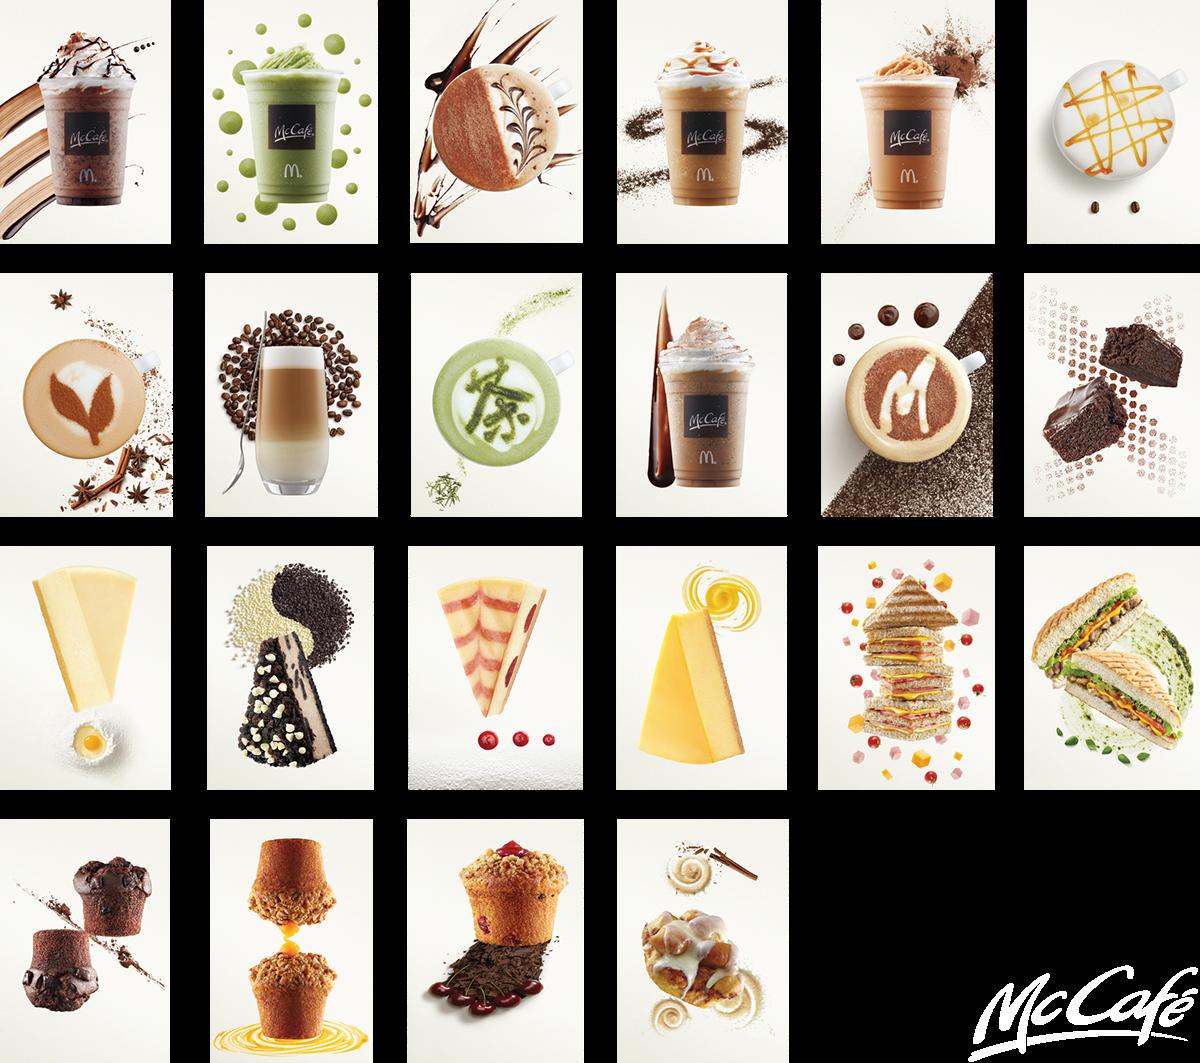 McCafé Singapore Food Art on Behance.